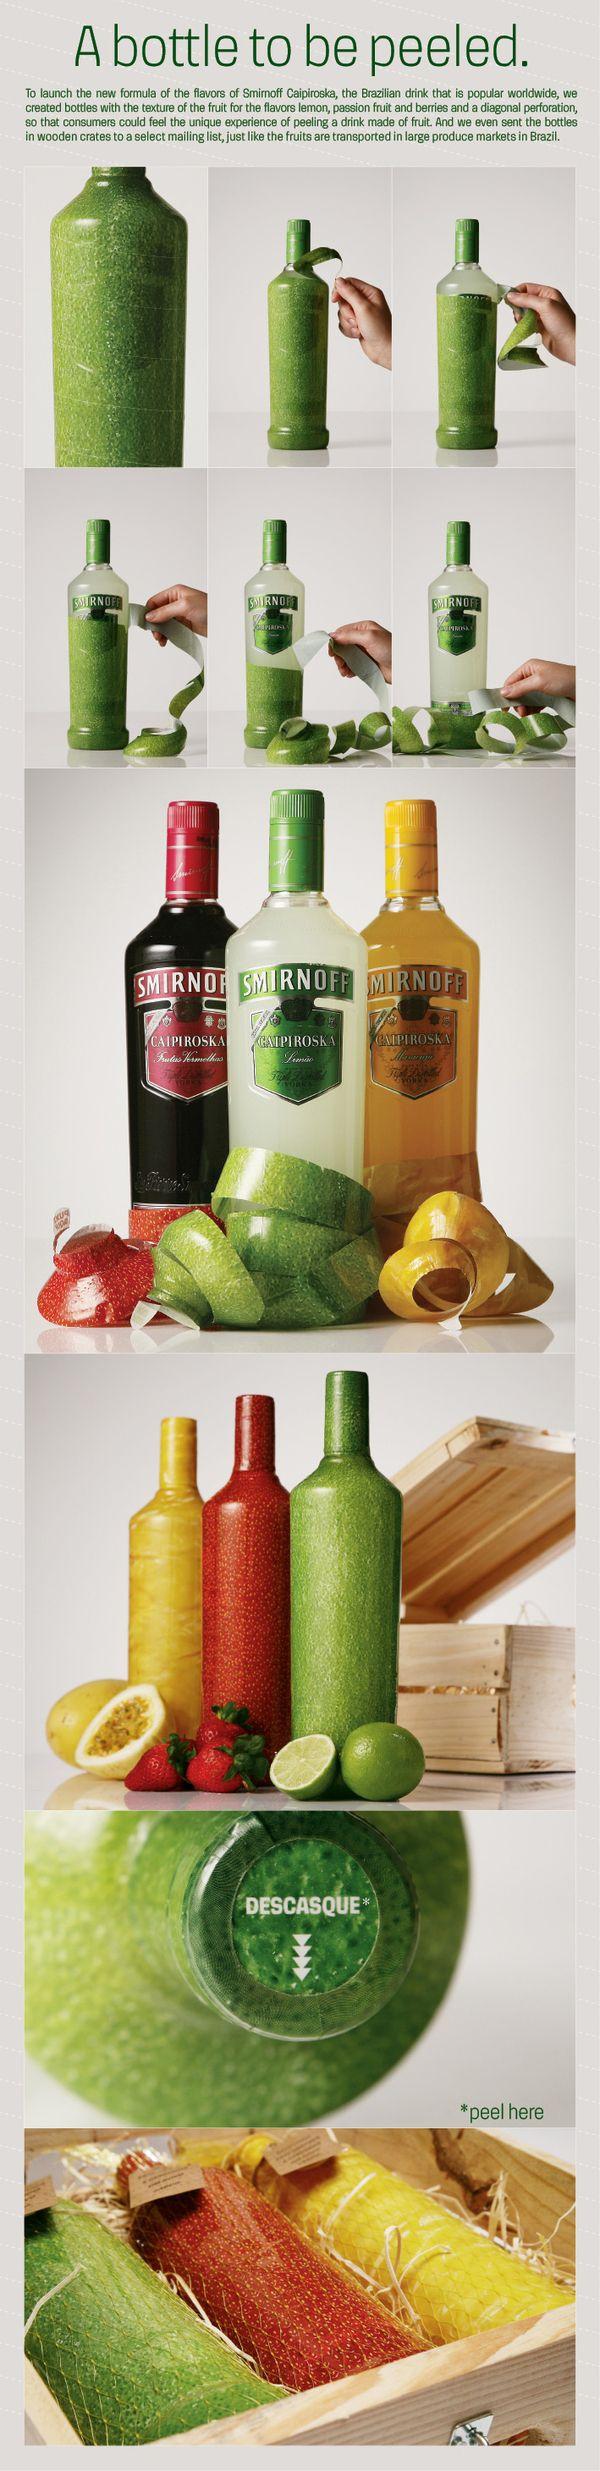 Smirnoff Caipiroska Peelable Bottle by Vinicius Montana, via Behance